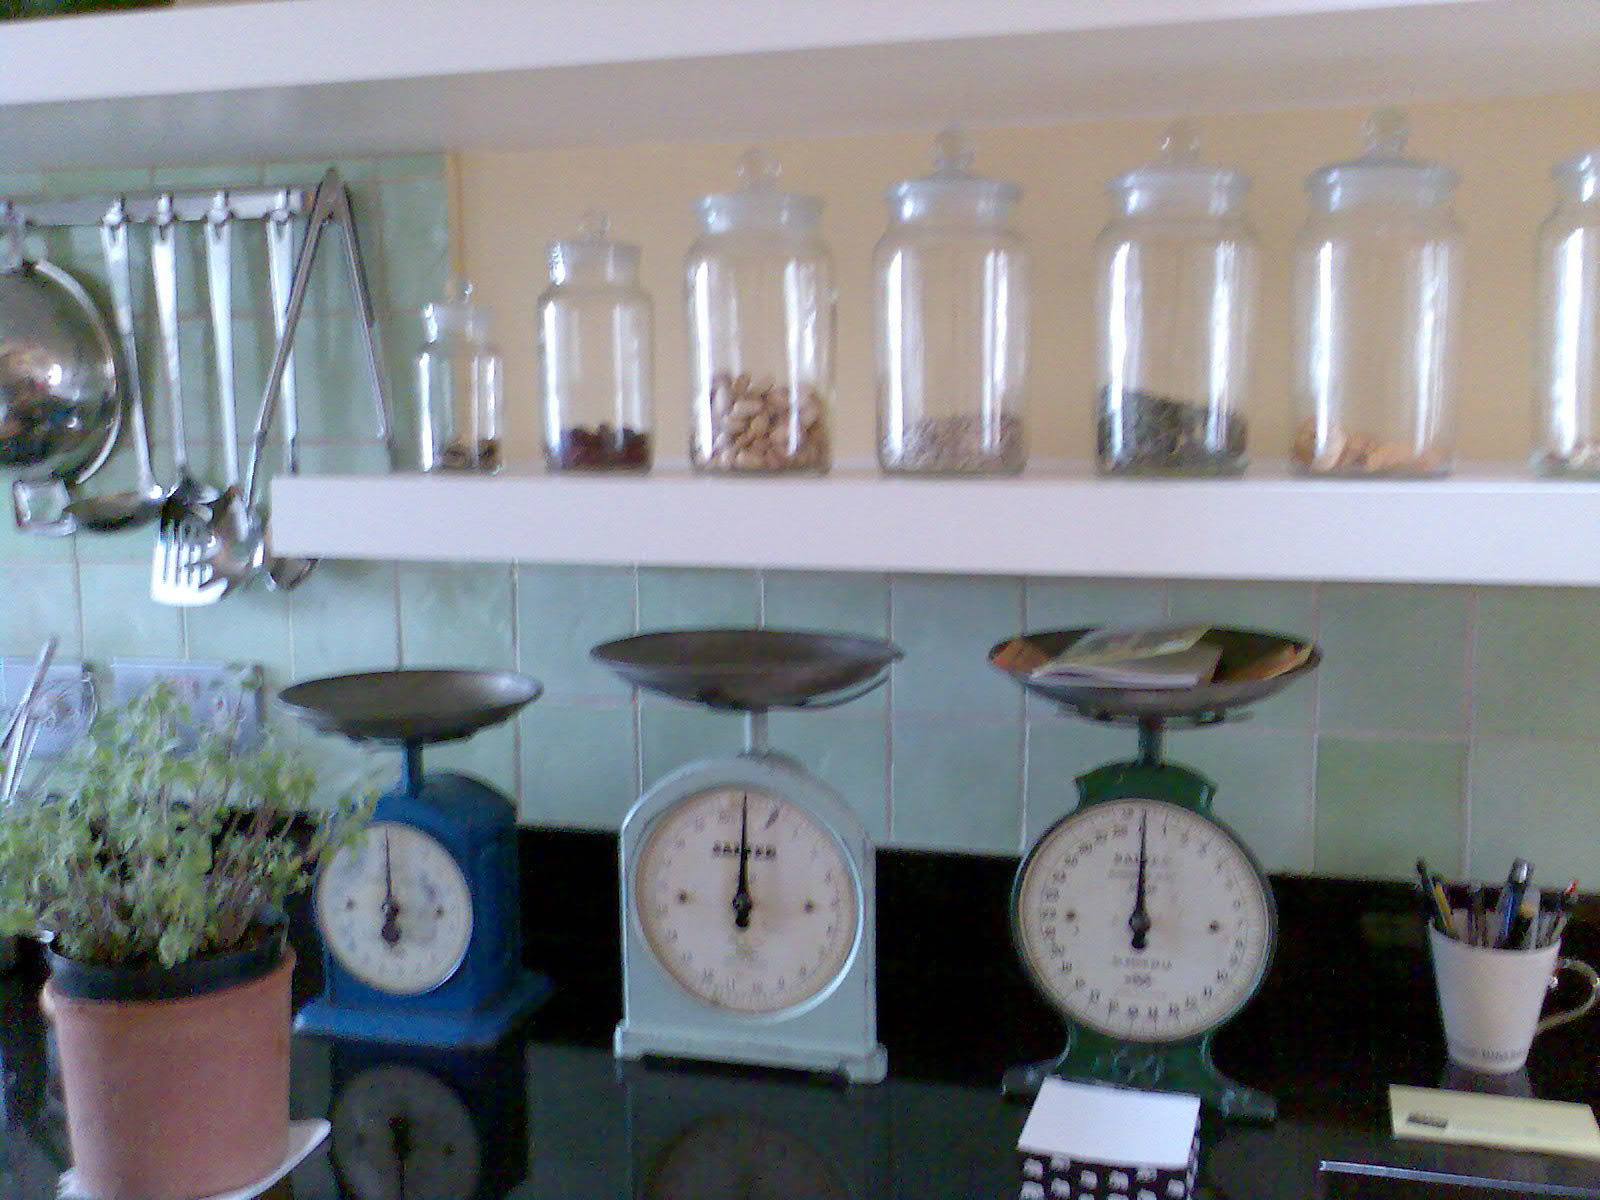 kitchen counter close up. Kitchen RHS Counter And Galss Jars Close-up.jpg Close Up